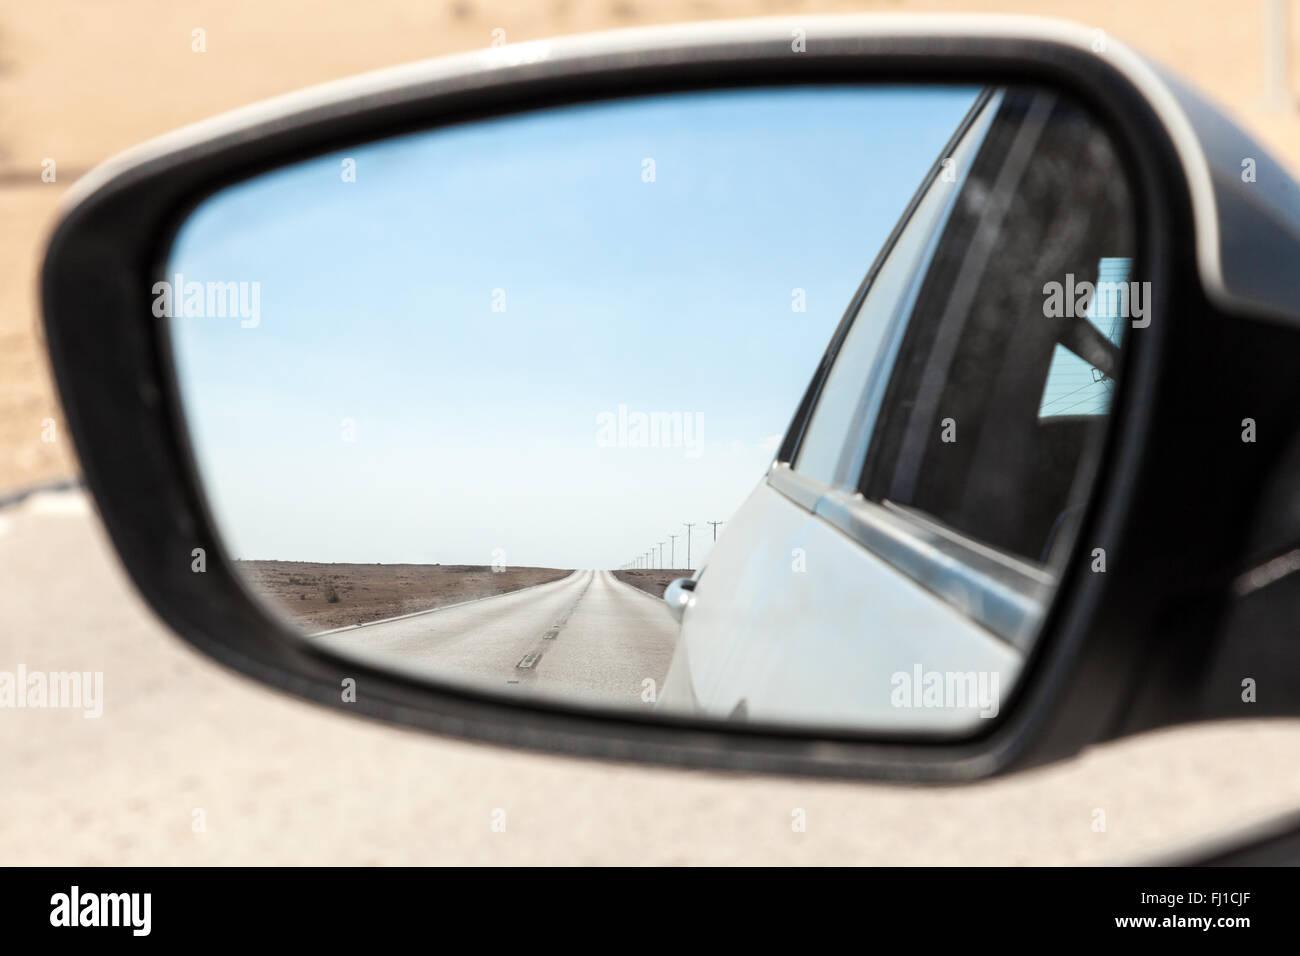 Desert road in Qatar in rear view mirror - Stock Image